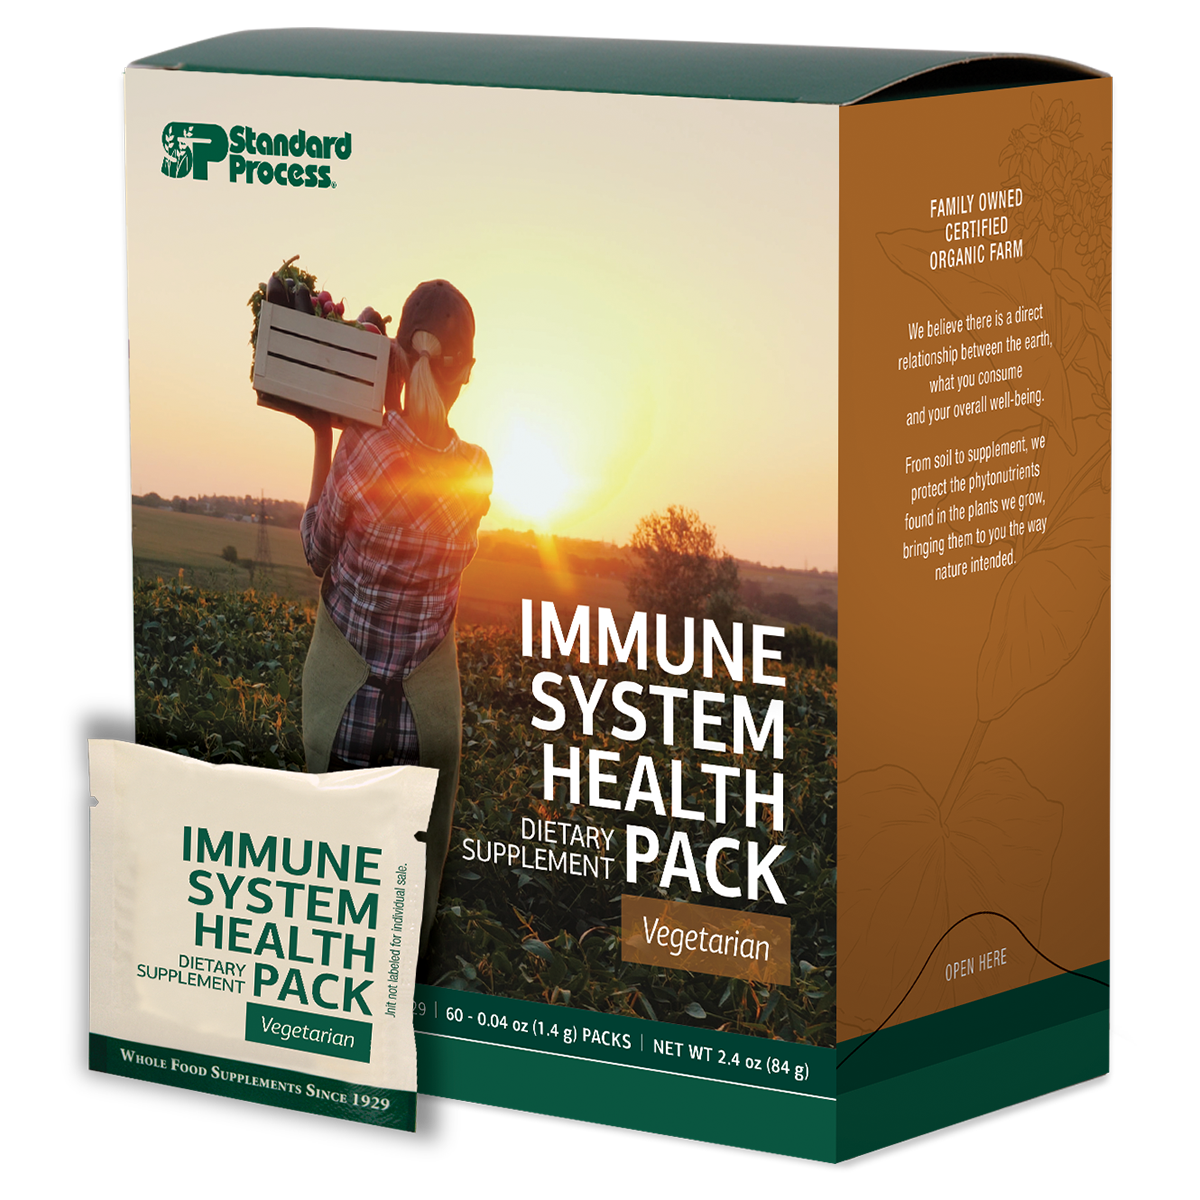 Immune System Health Pack - Vegetarian